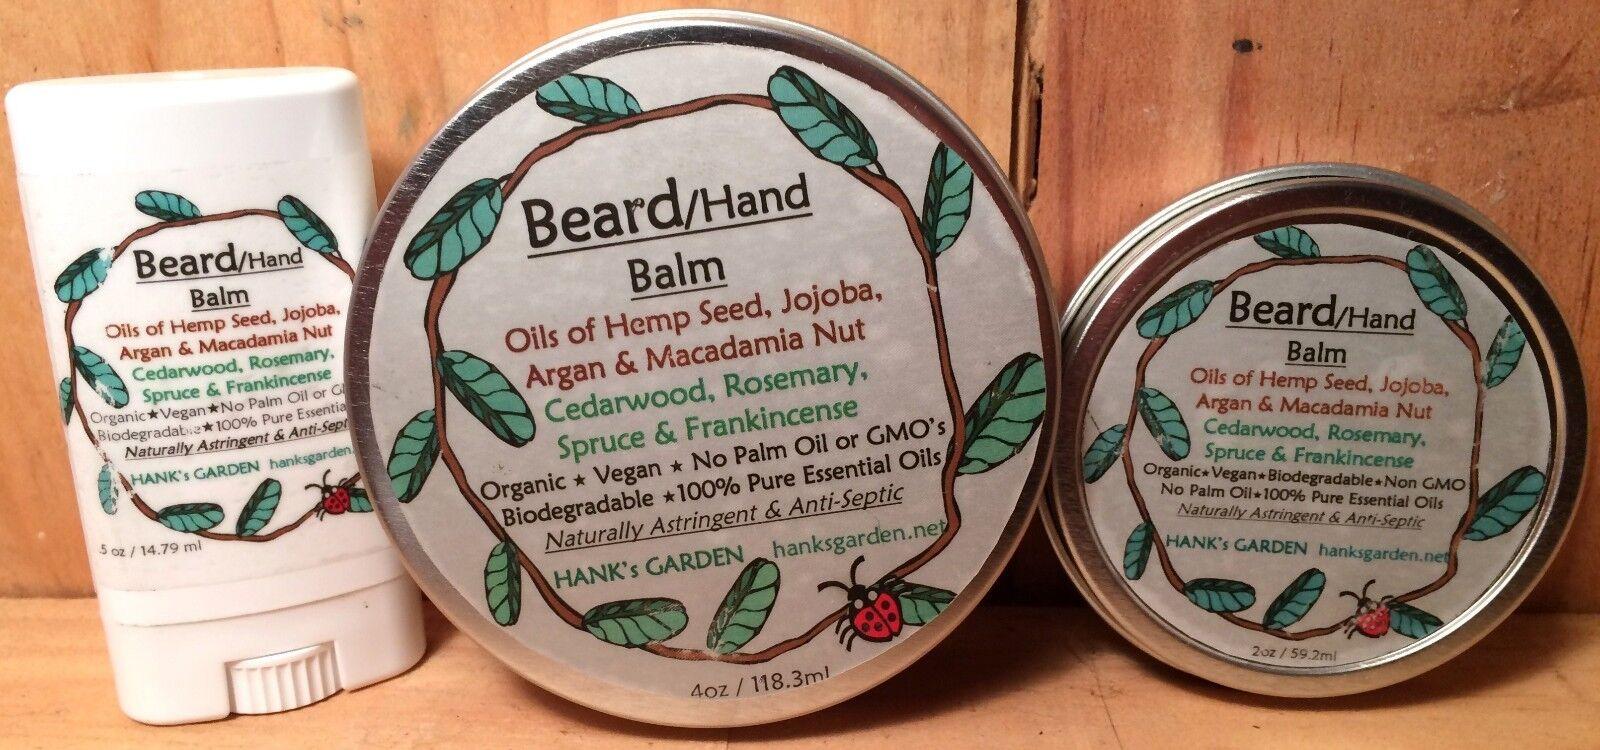 Beard/Hand Balm-Oils of Hemp Seed, Jojoba, Argan & Macadamia